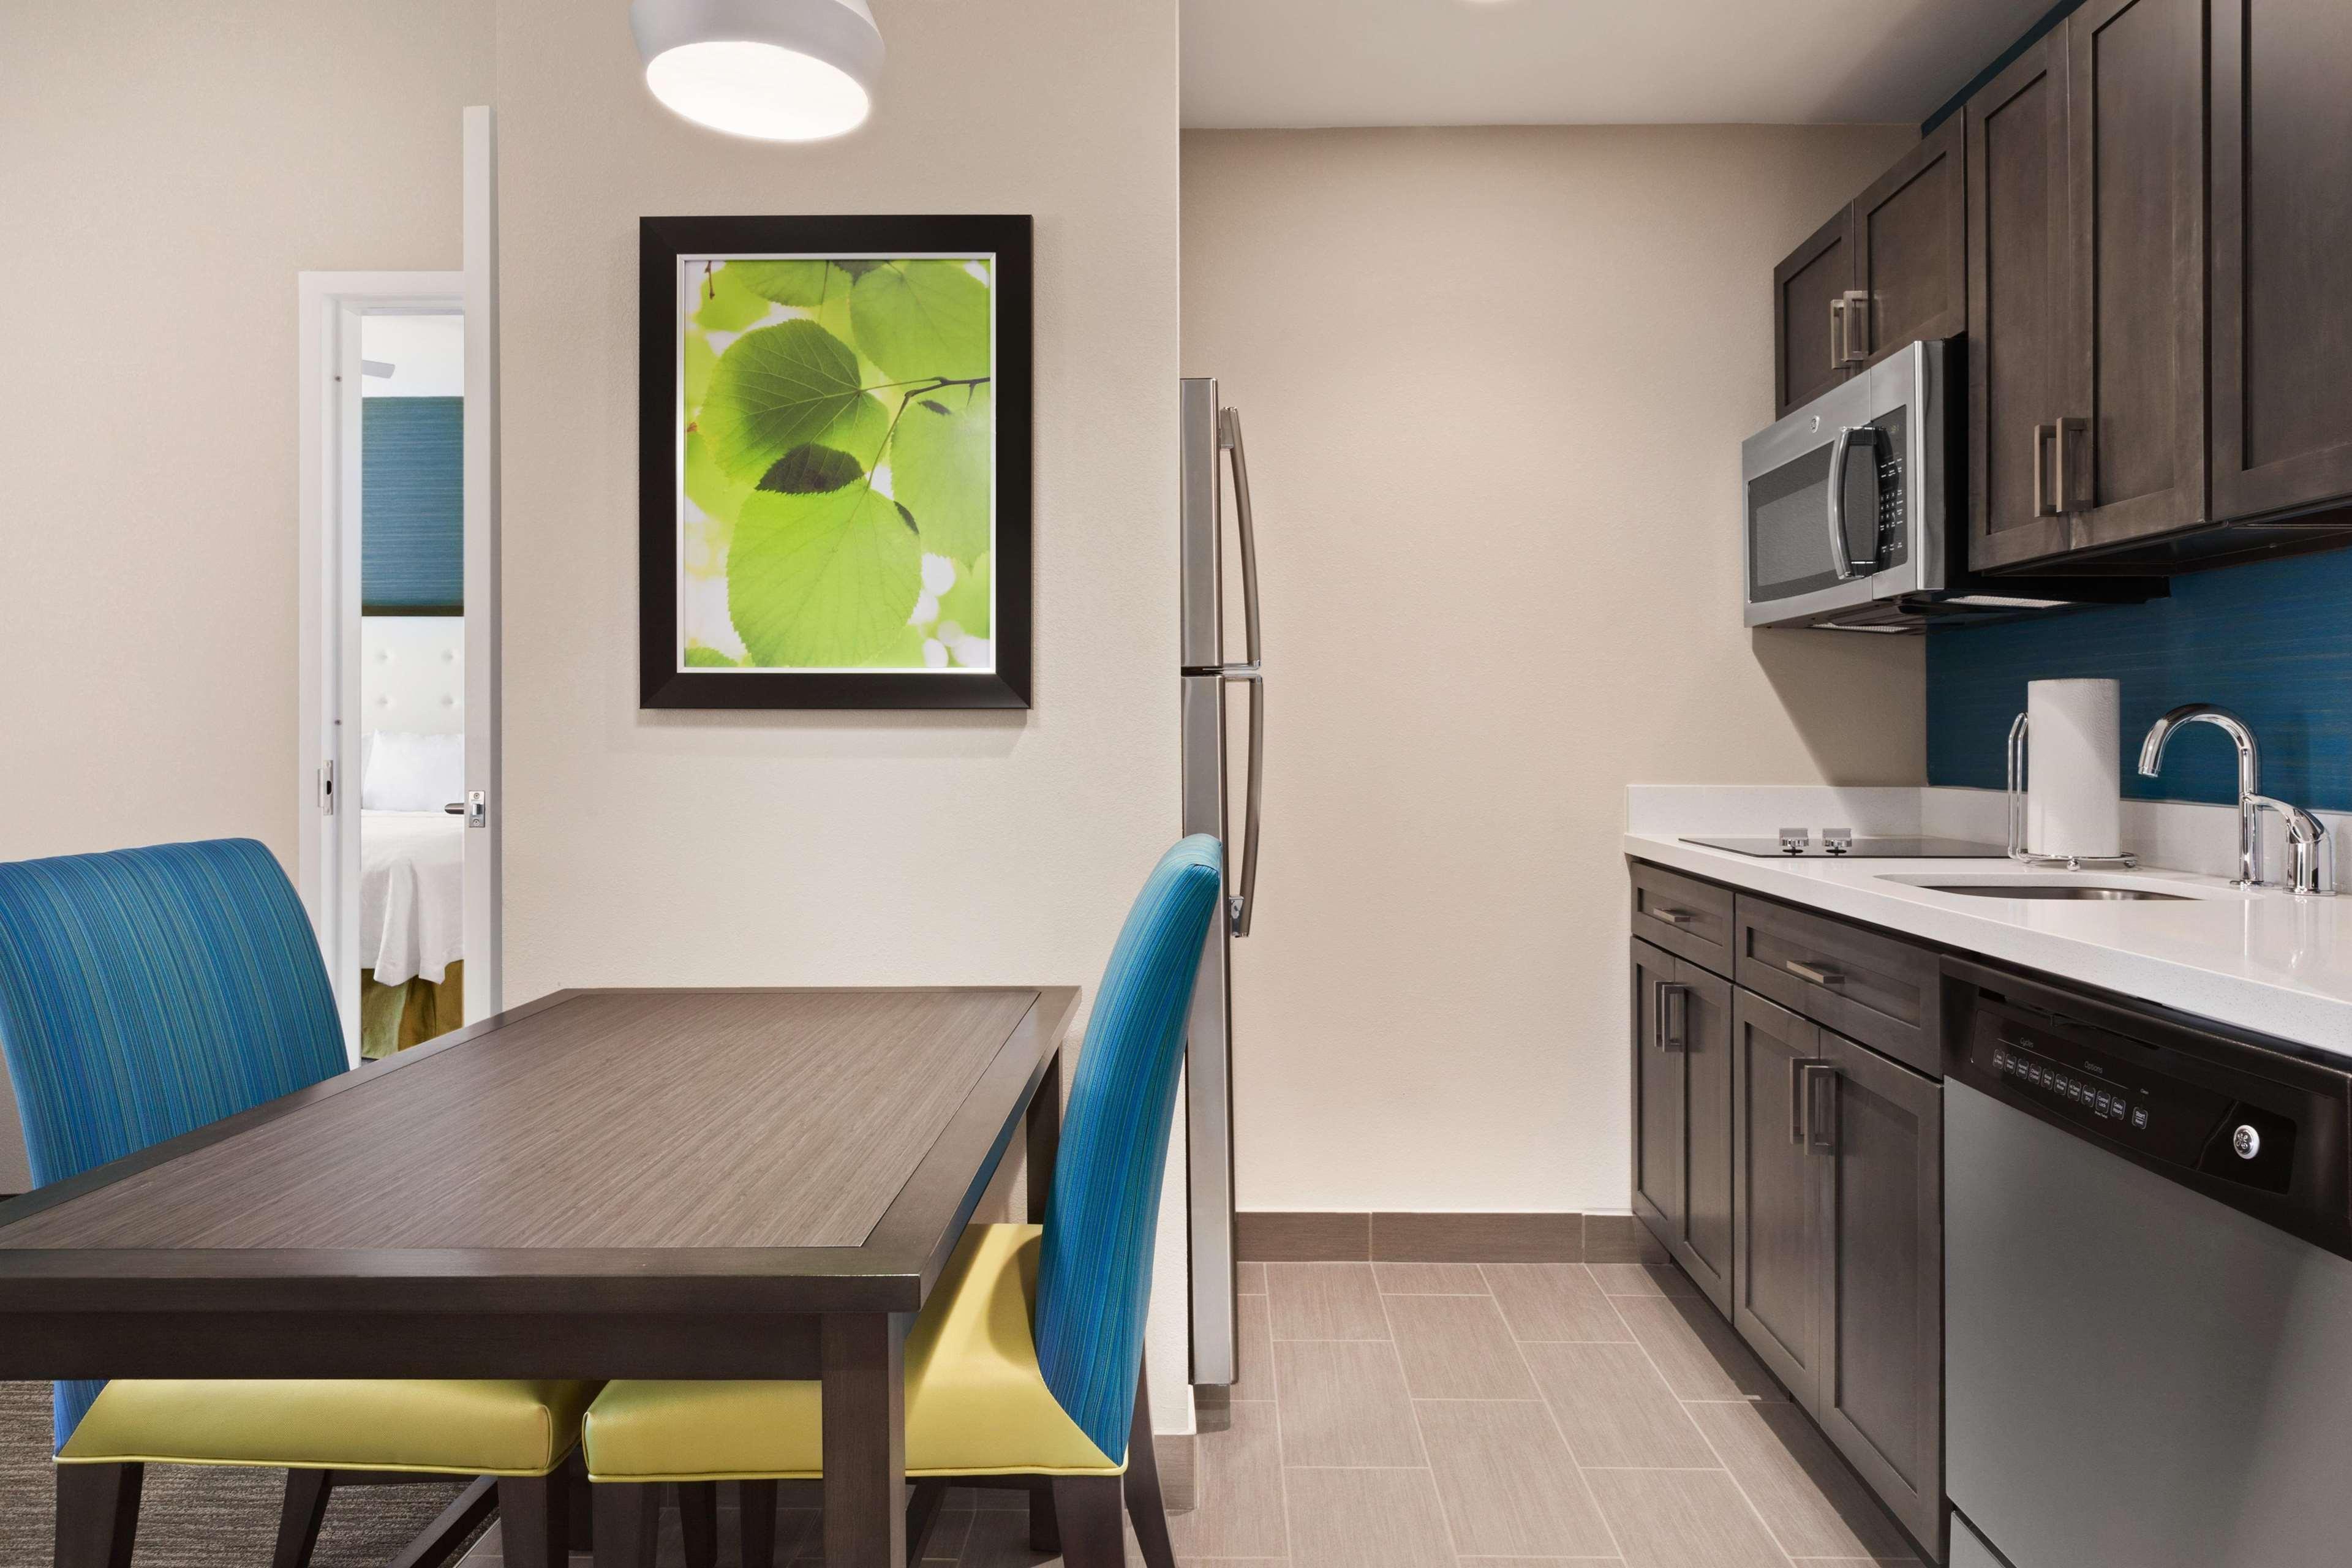 Homewood Suites by Hilton Charlotte/SouthPark image 25